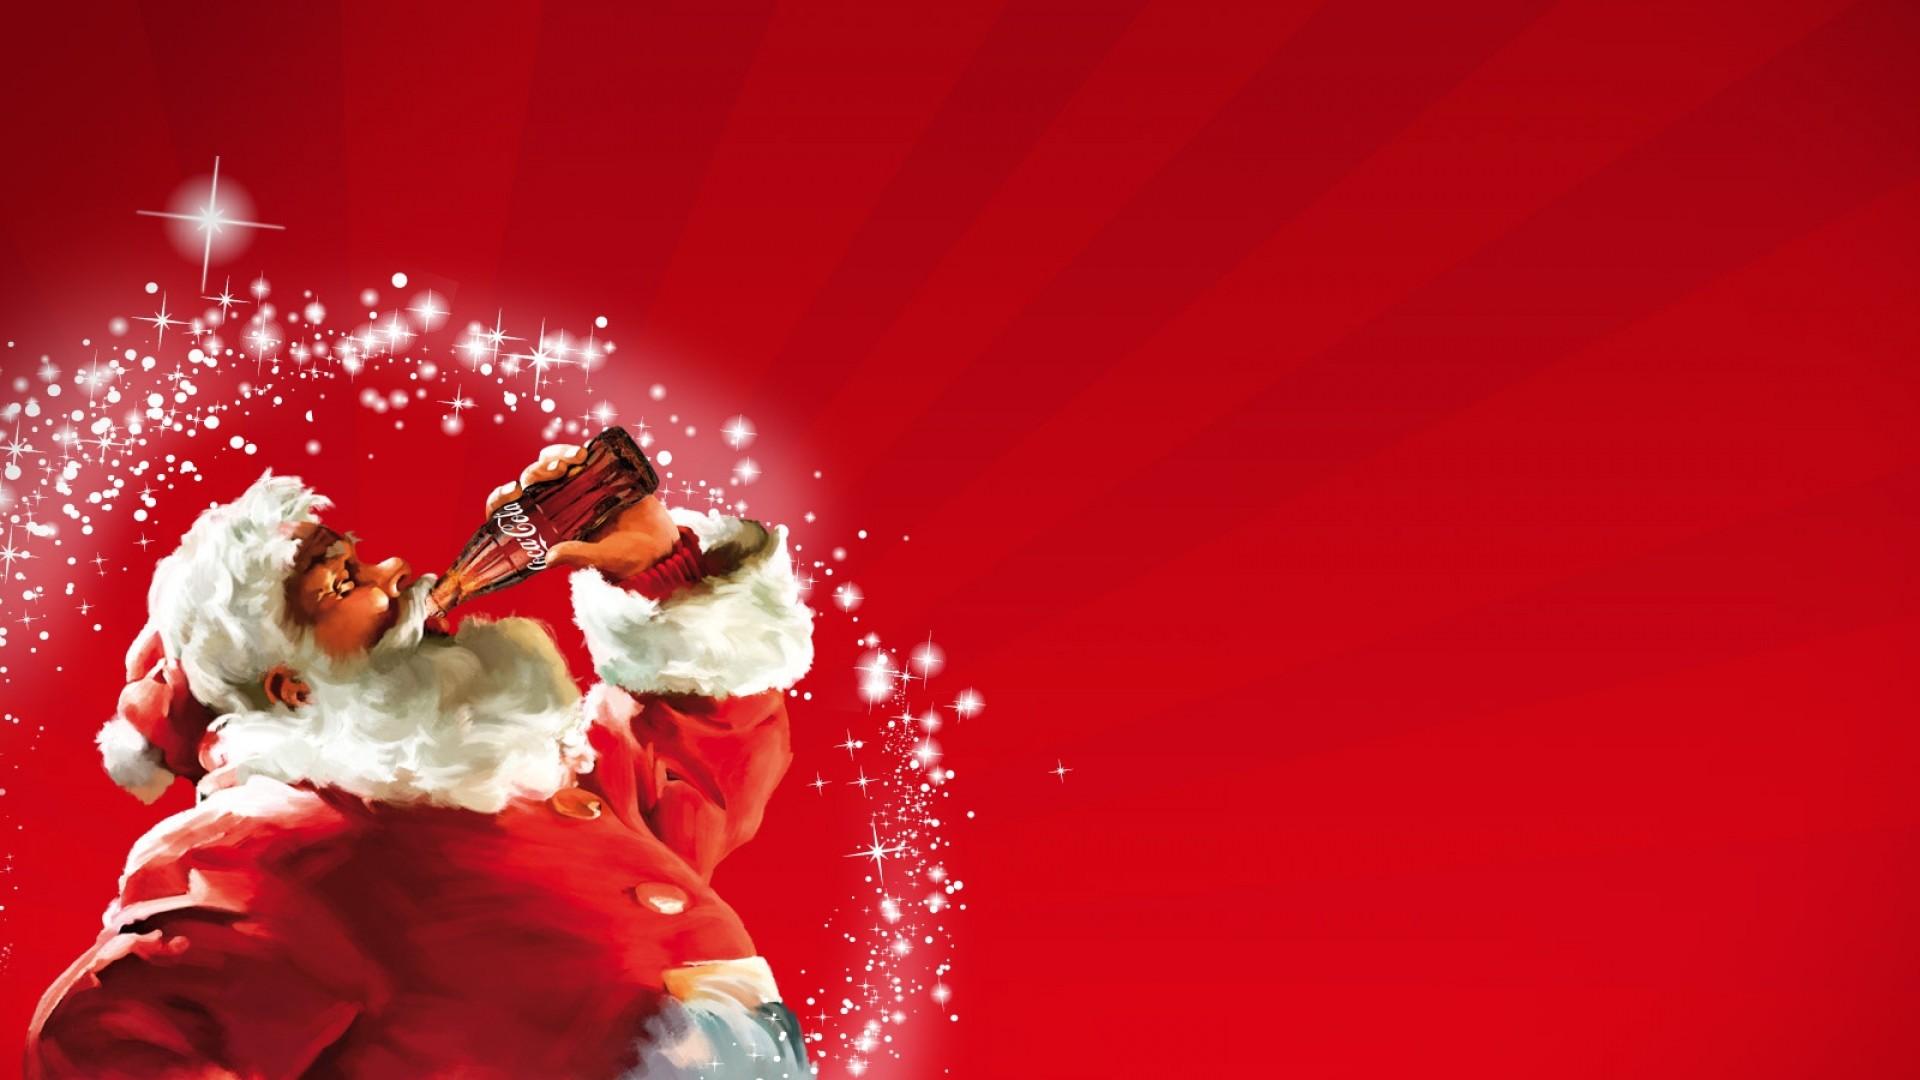 Santa Claus Coca Cola Wallpaper (09)